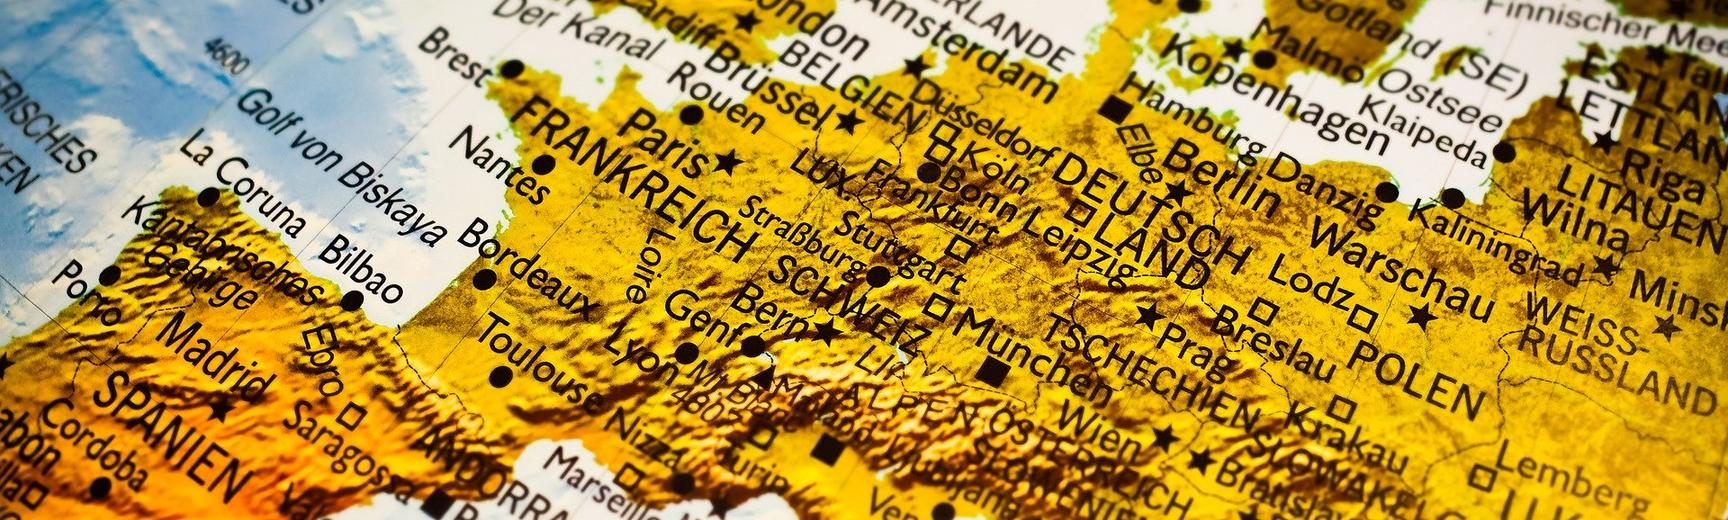 A map of Europe written in German - pixabay